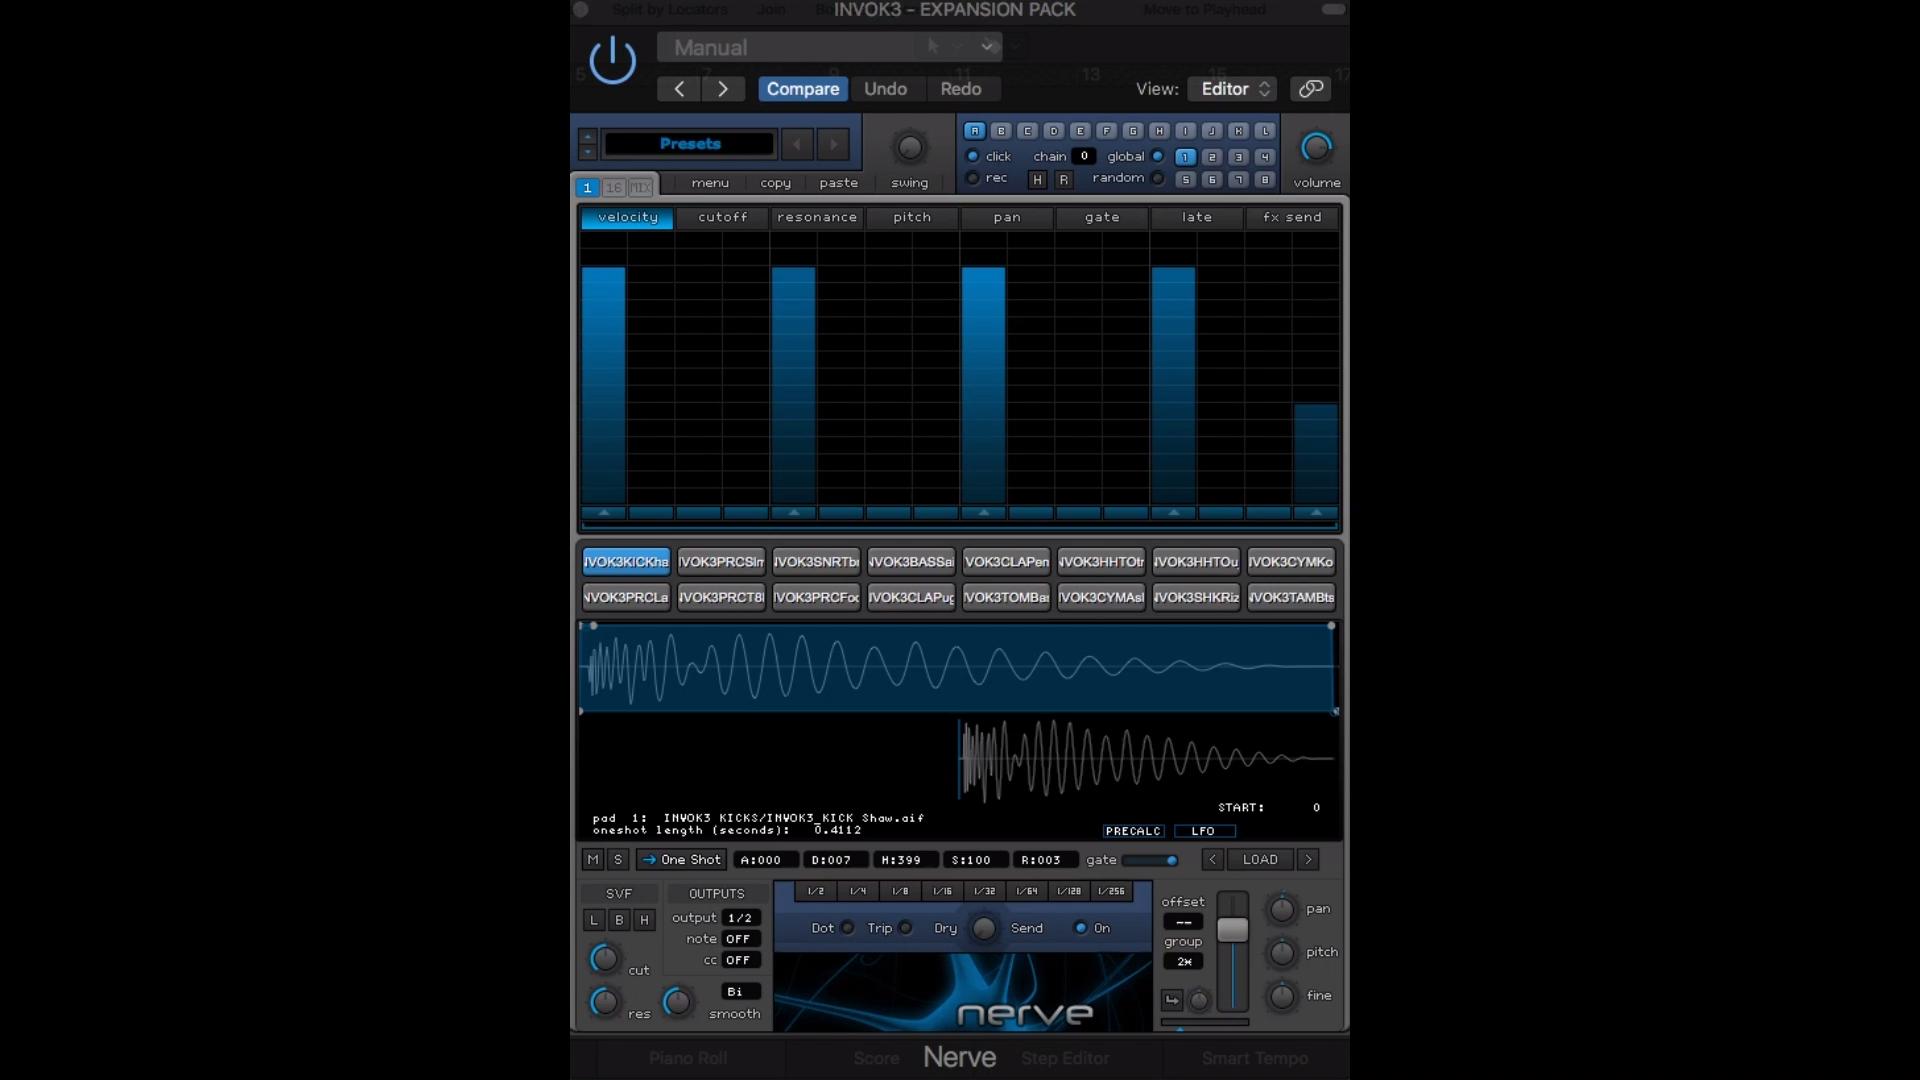 Xfer Nerve Drum Machine Preset Sample Pack Invok3 House Spirit Video Video House Music Techno Music Dance Music